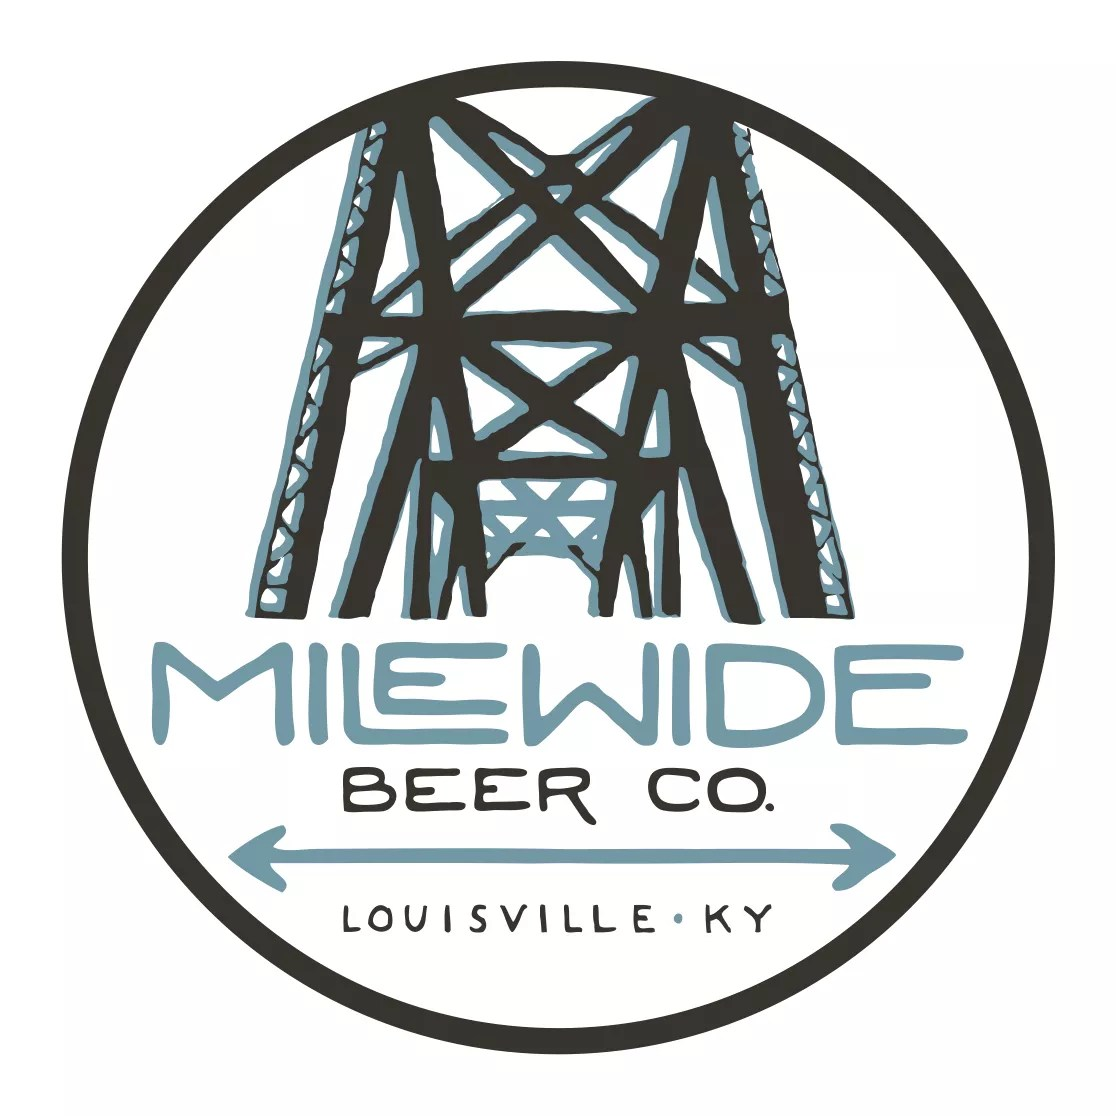 Mile Wide